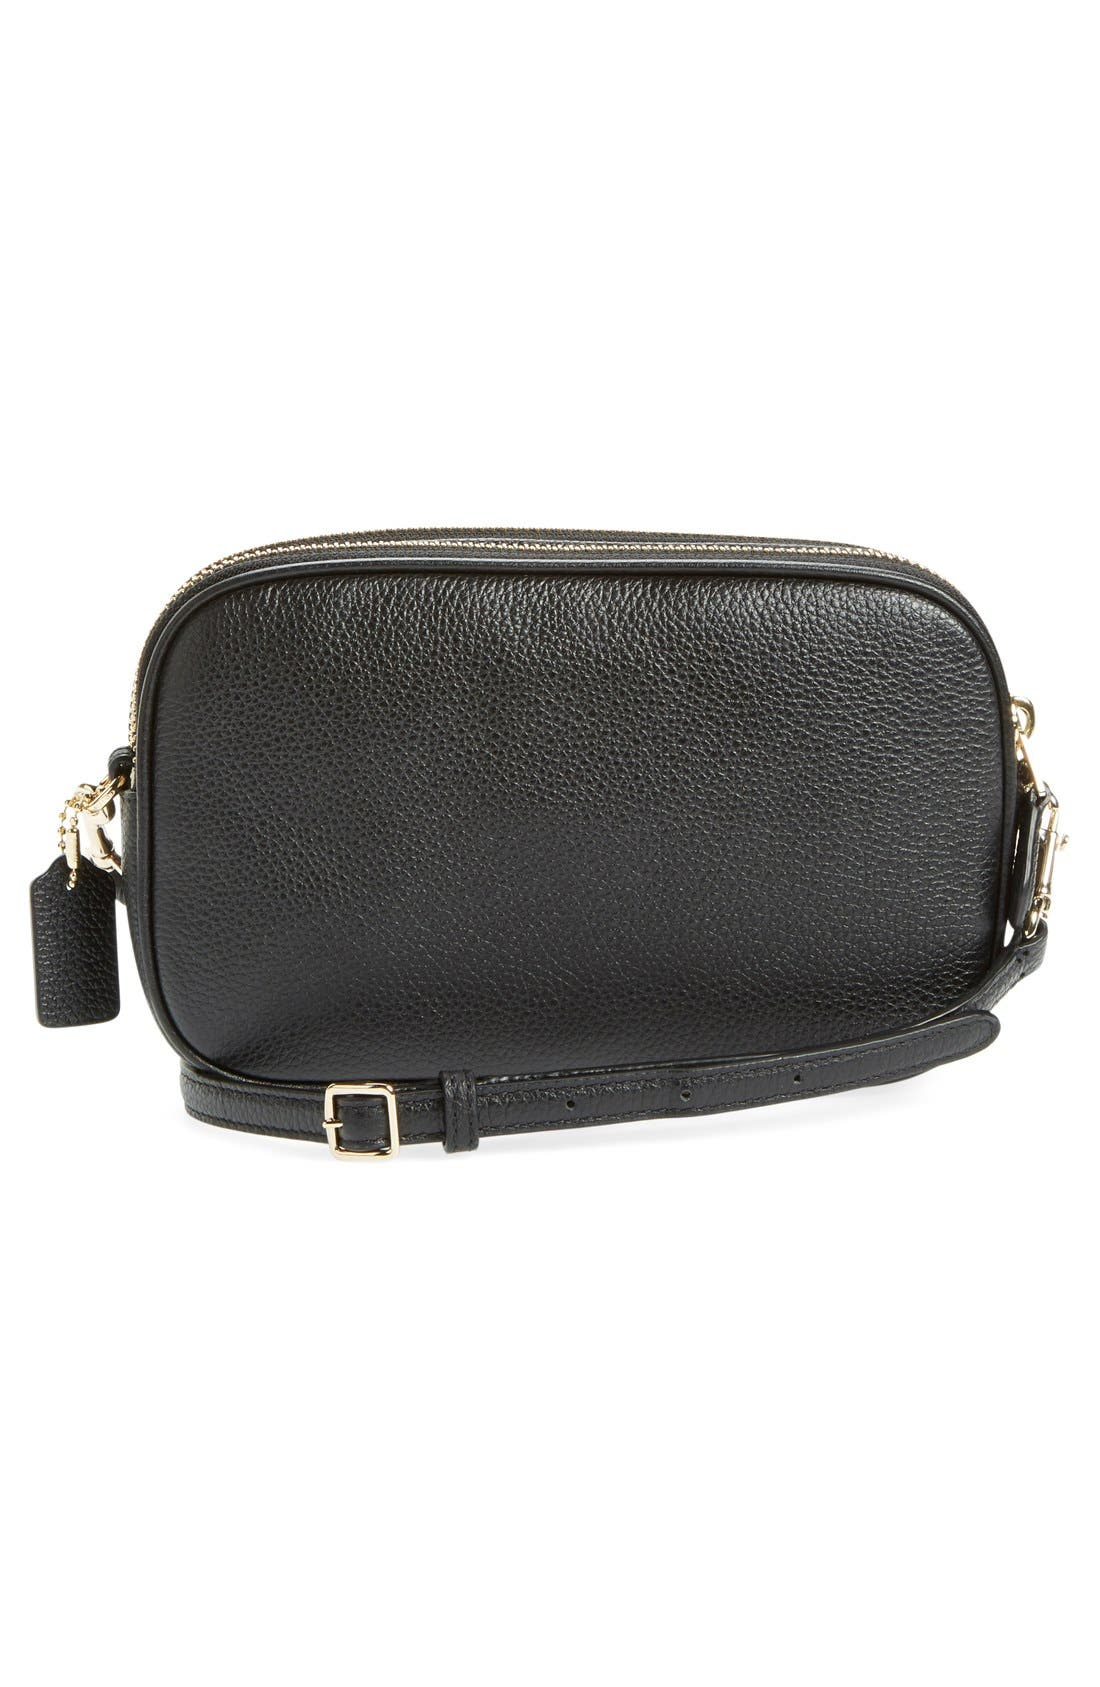 Convertible Leather Crossbody Bag,                             Alternate thumbnail 2, color,                             001